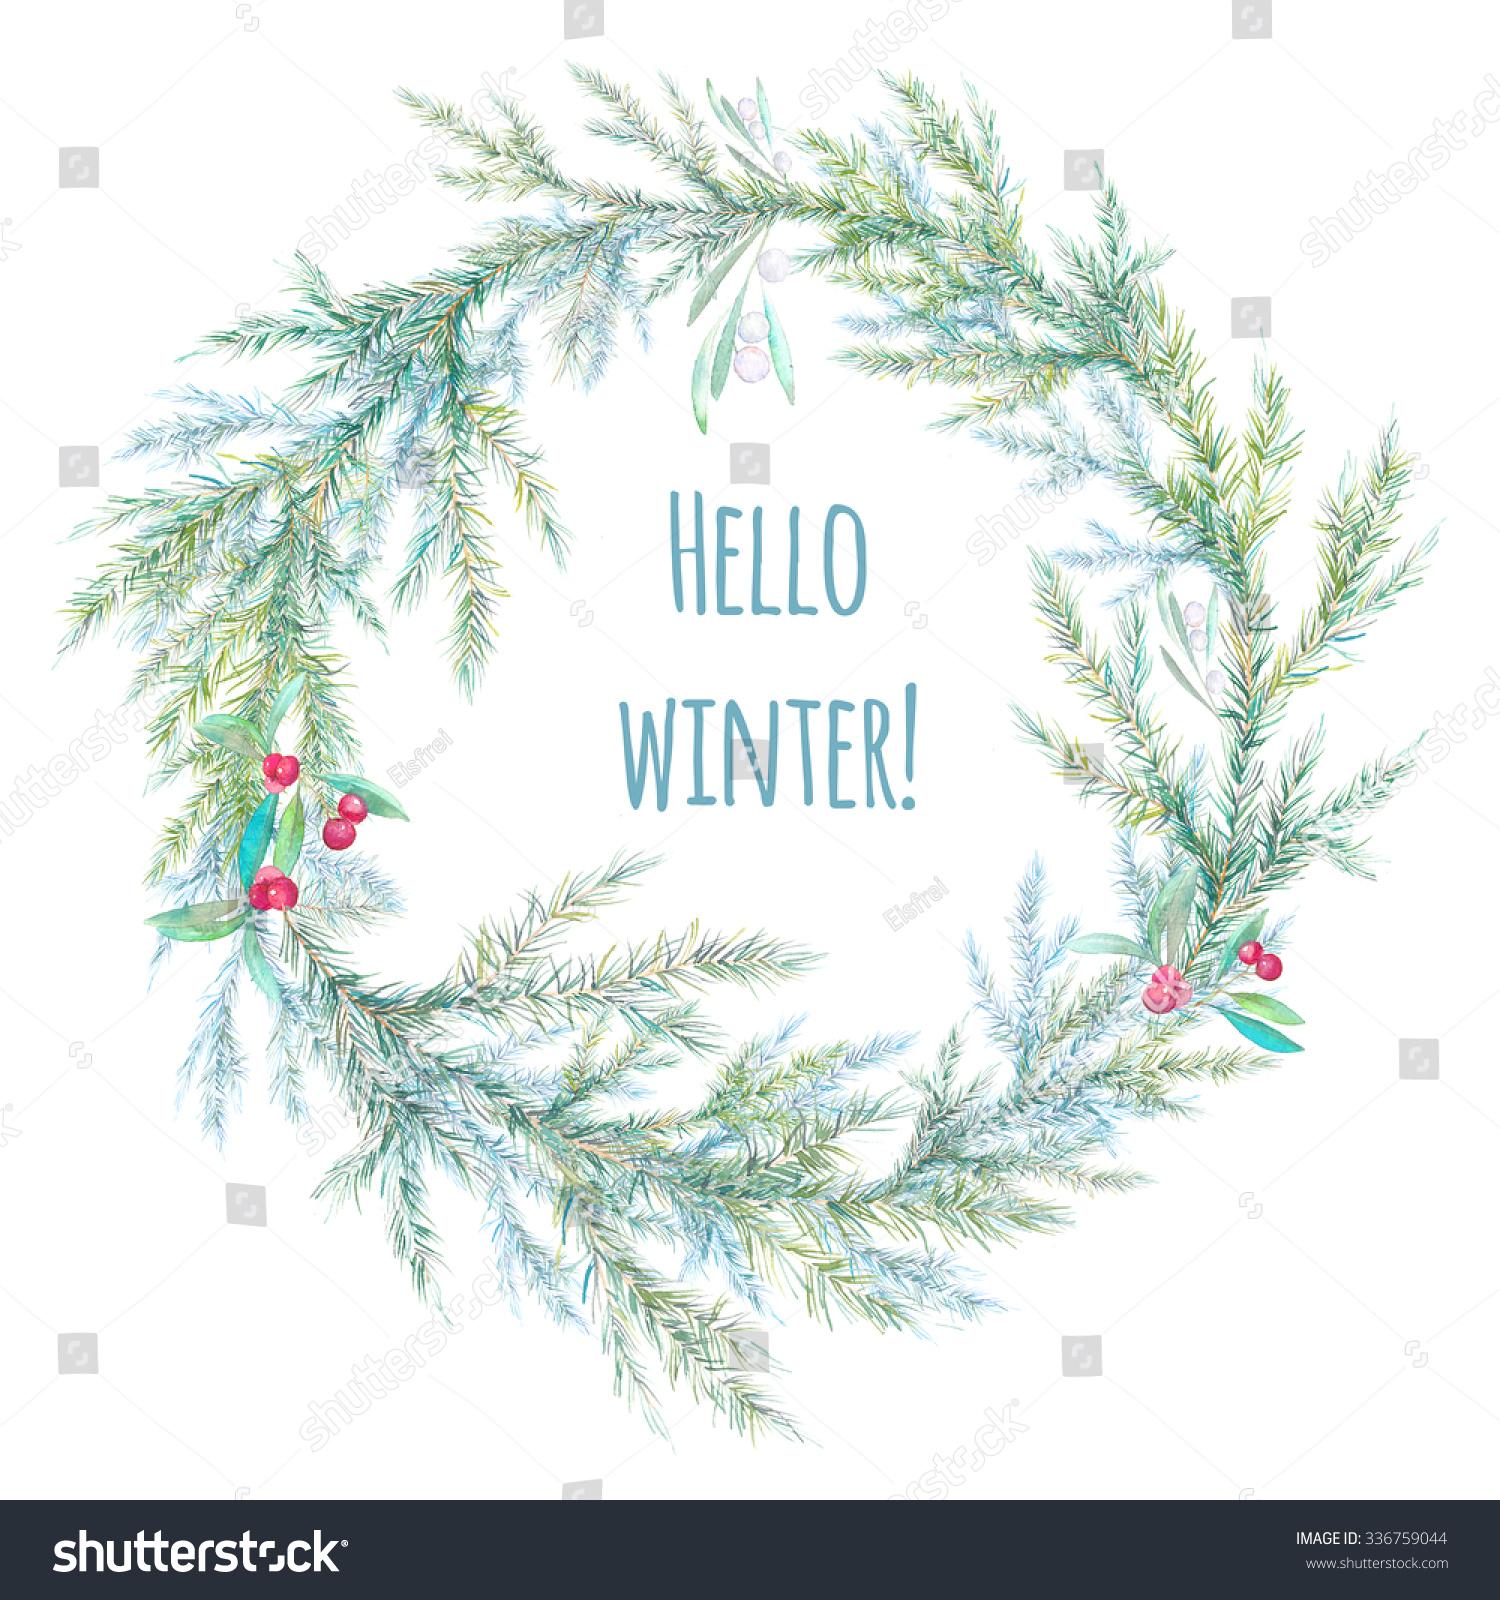 Hello Winter Watercolor Christmas Tree Holly Stockillustration ...